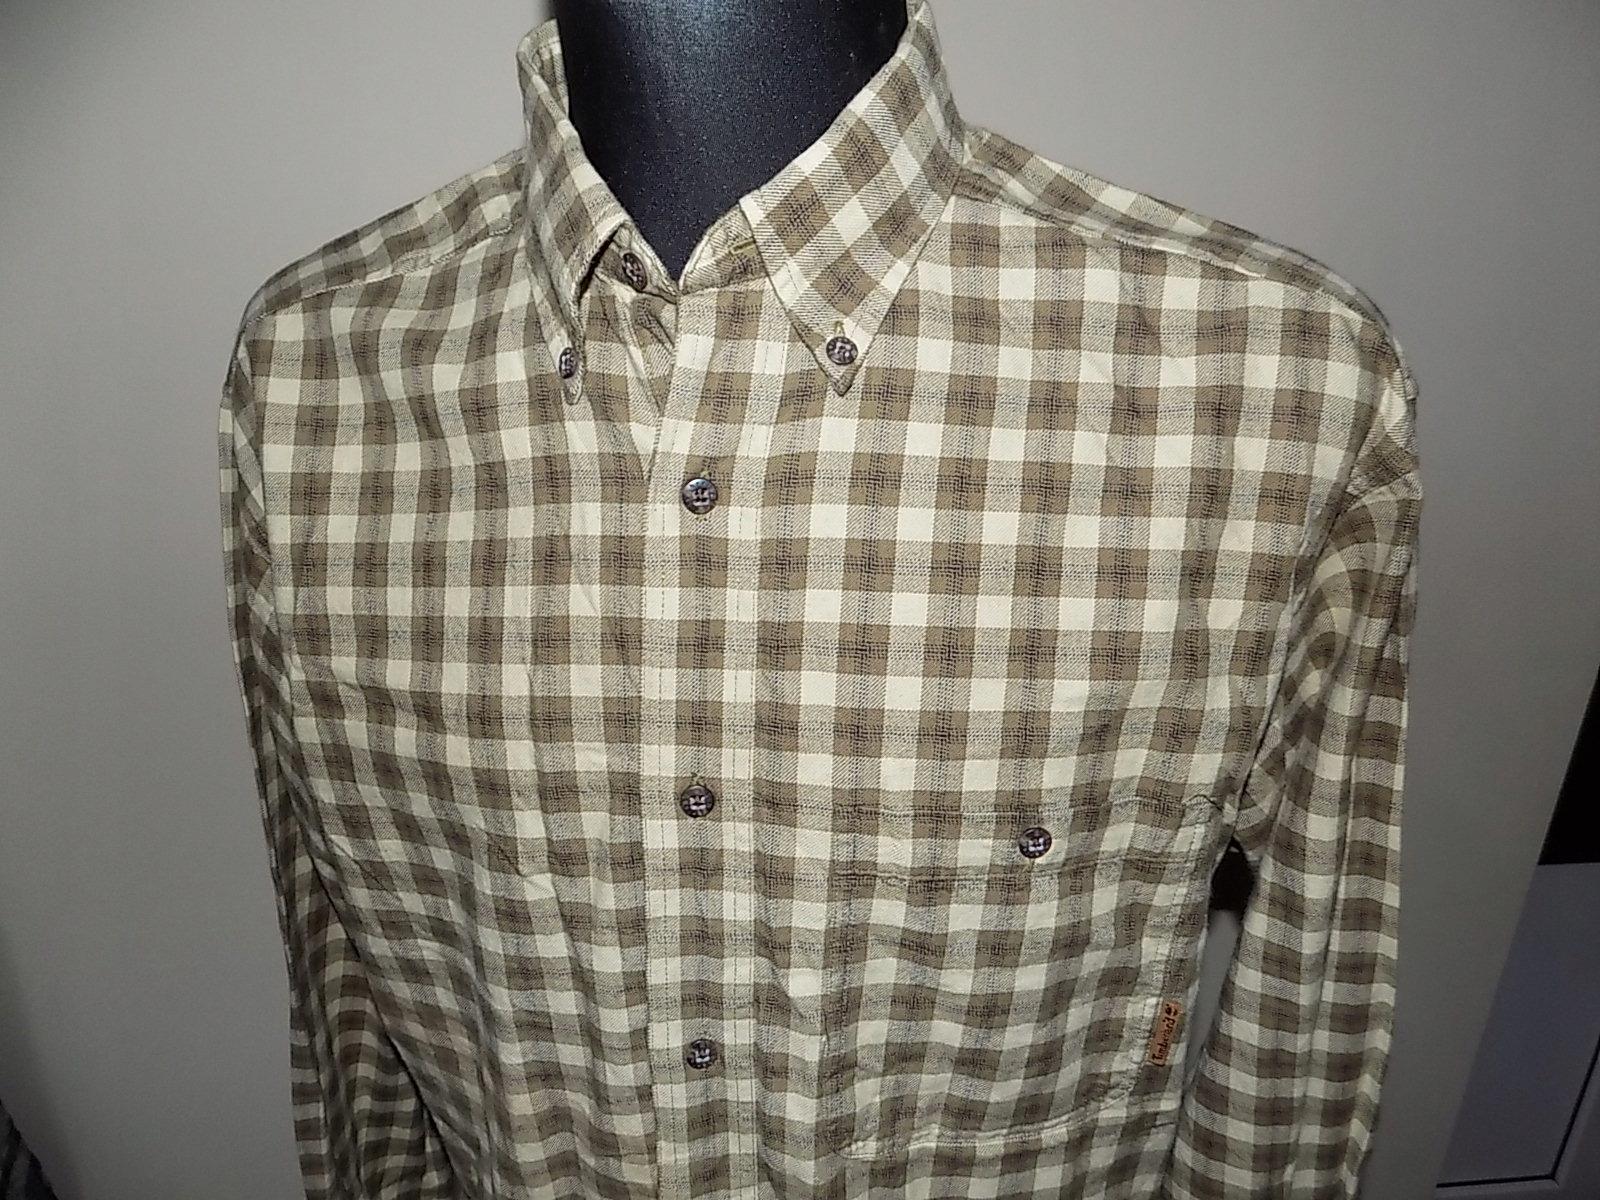 Timberland koszula męska M 41 flanelowa ciepła